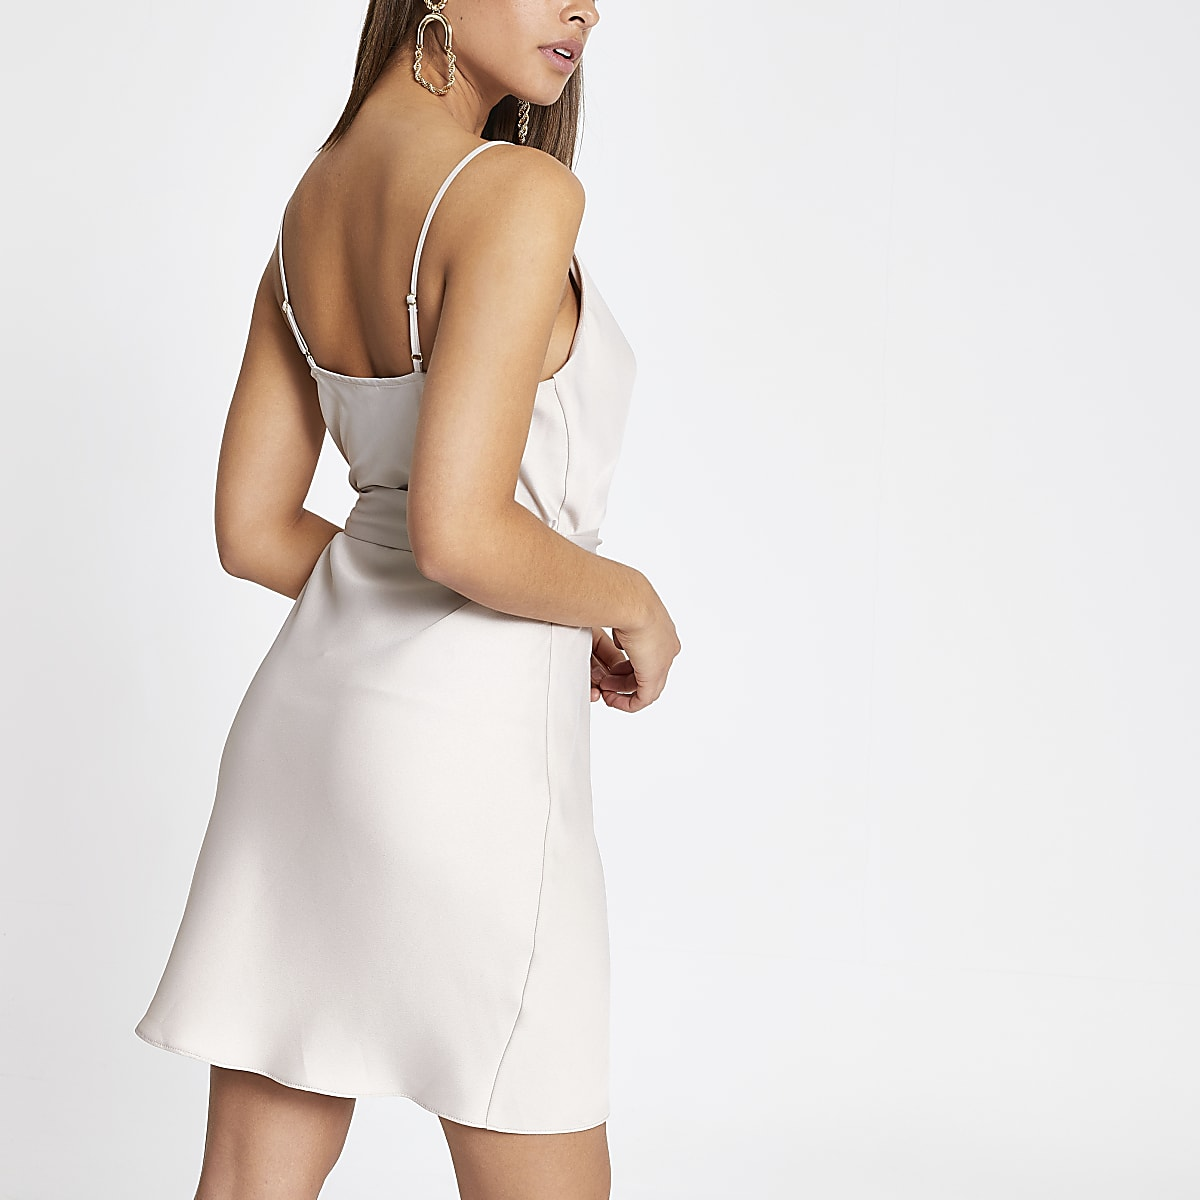 5b59c0e8fa44a Beige cowl neck belted slip dress - Slip & Cami Dresses - Dresses ...